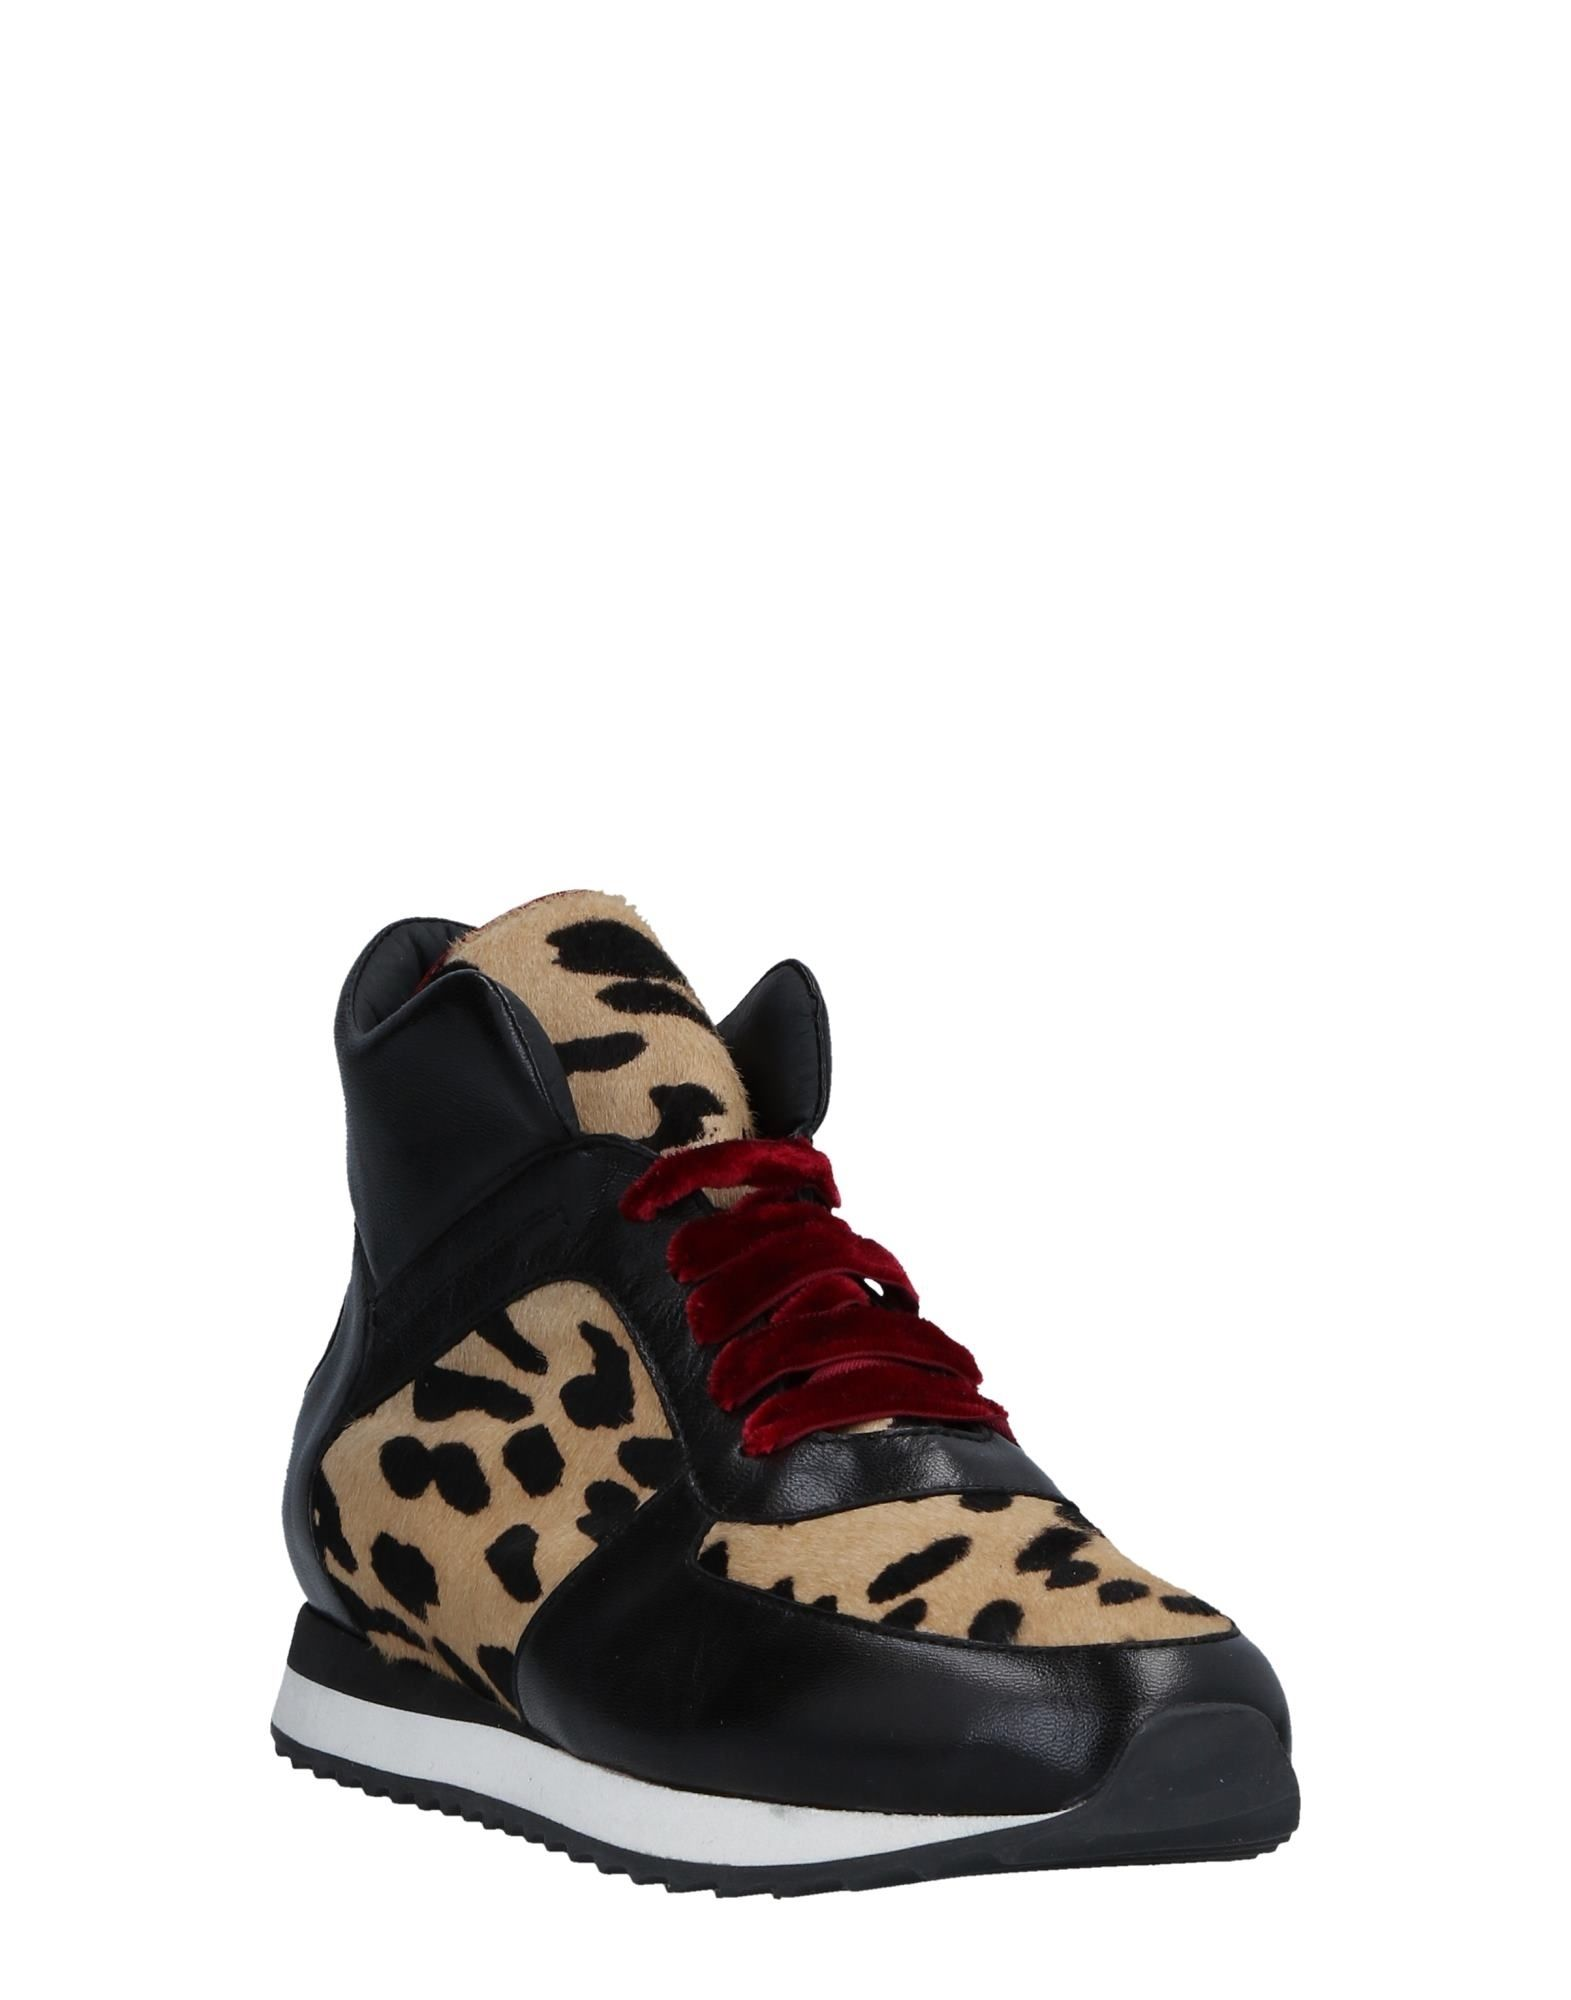 Fragiacomo  Sneakers Damen  Fragiacomo 11519545UW Heiße Schuhe c22341